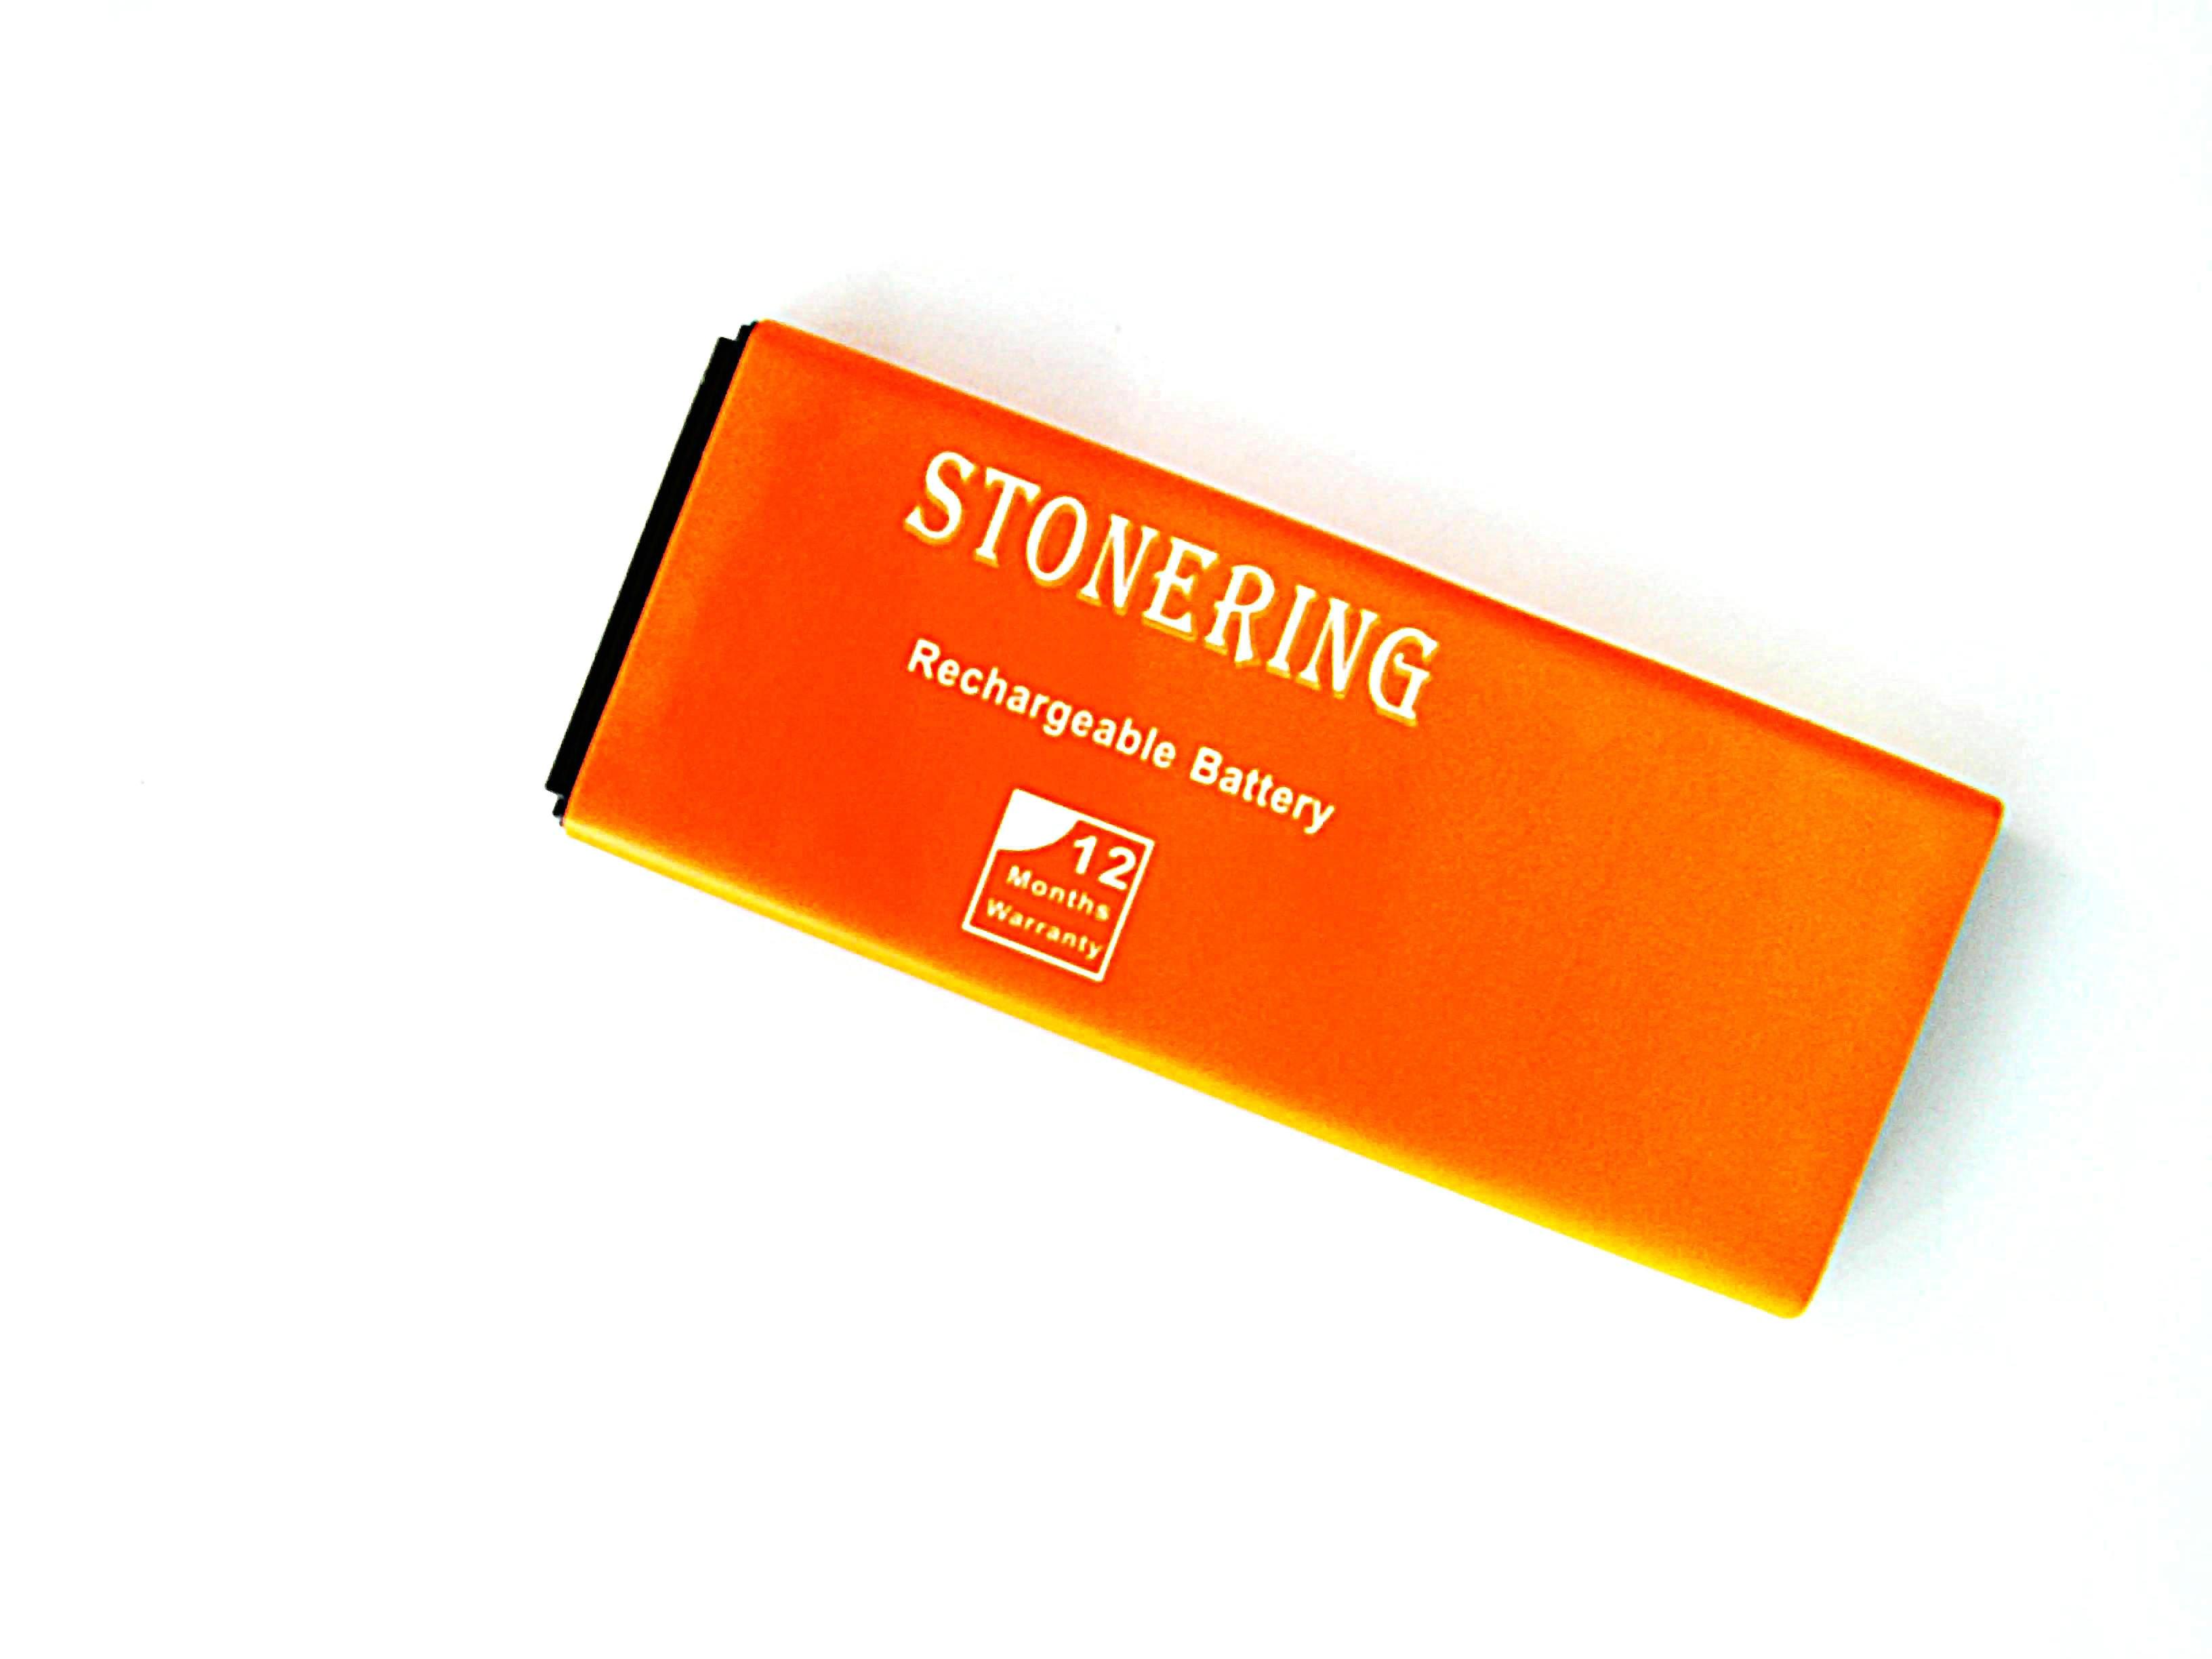 StoneRing <font><b>hb4342a1rbc</b></font> 2200 мАч Батарея для Huawei Honor 4A scl-tl00 SCL-Алу Y6 y635-l01 y635-tl00 scl-l00scl-l01 телефон